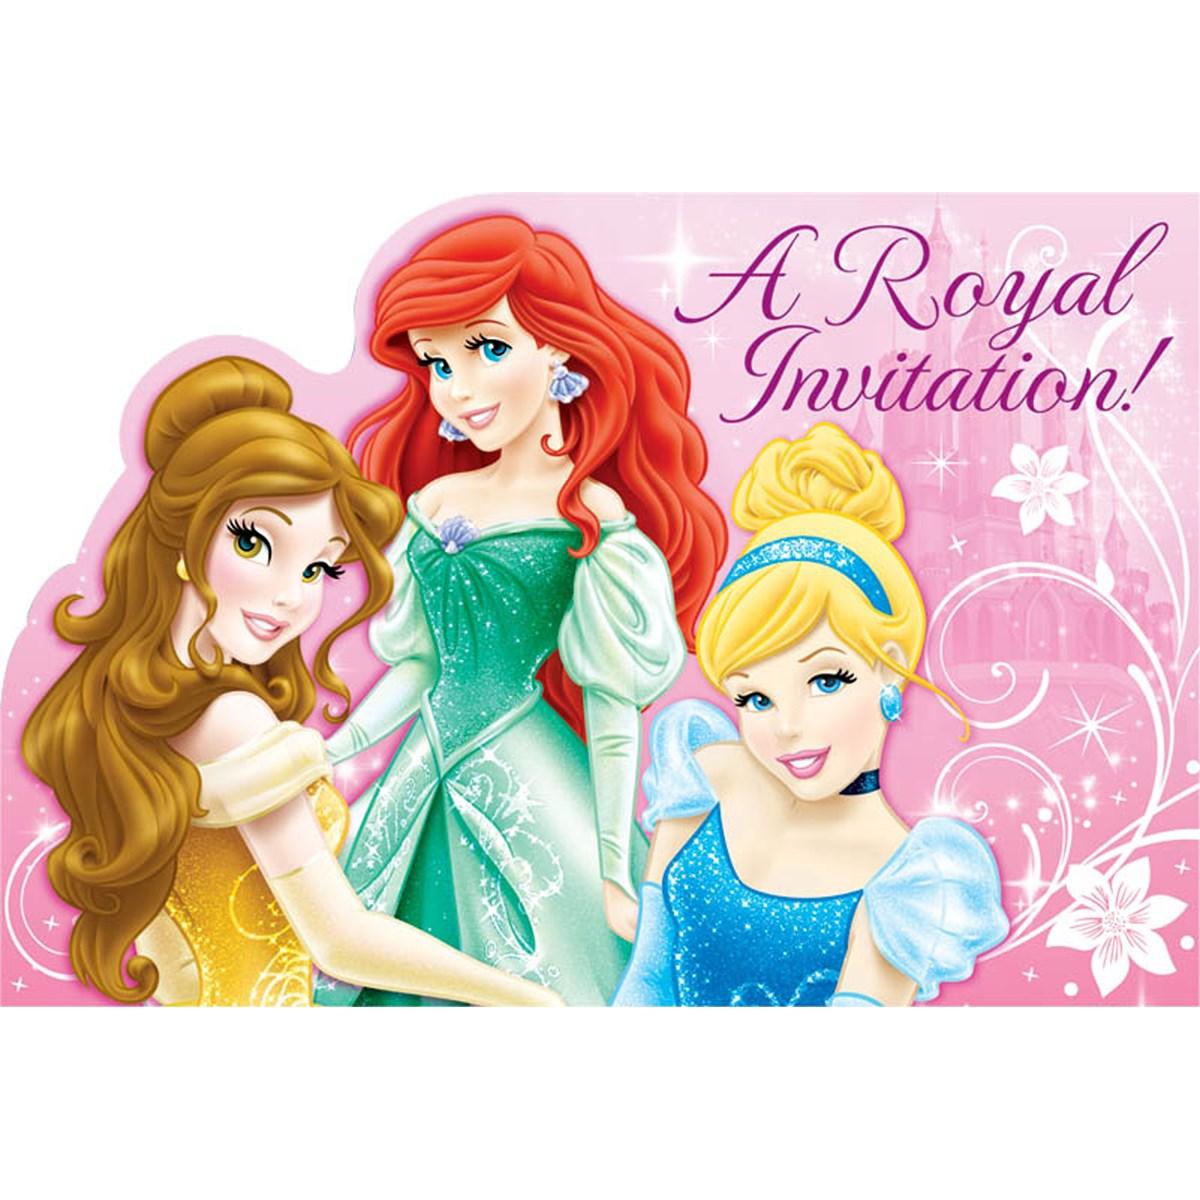 Disney Princess Invitations (8) | BirthdayExpress.com